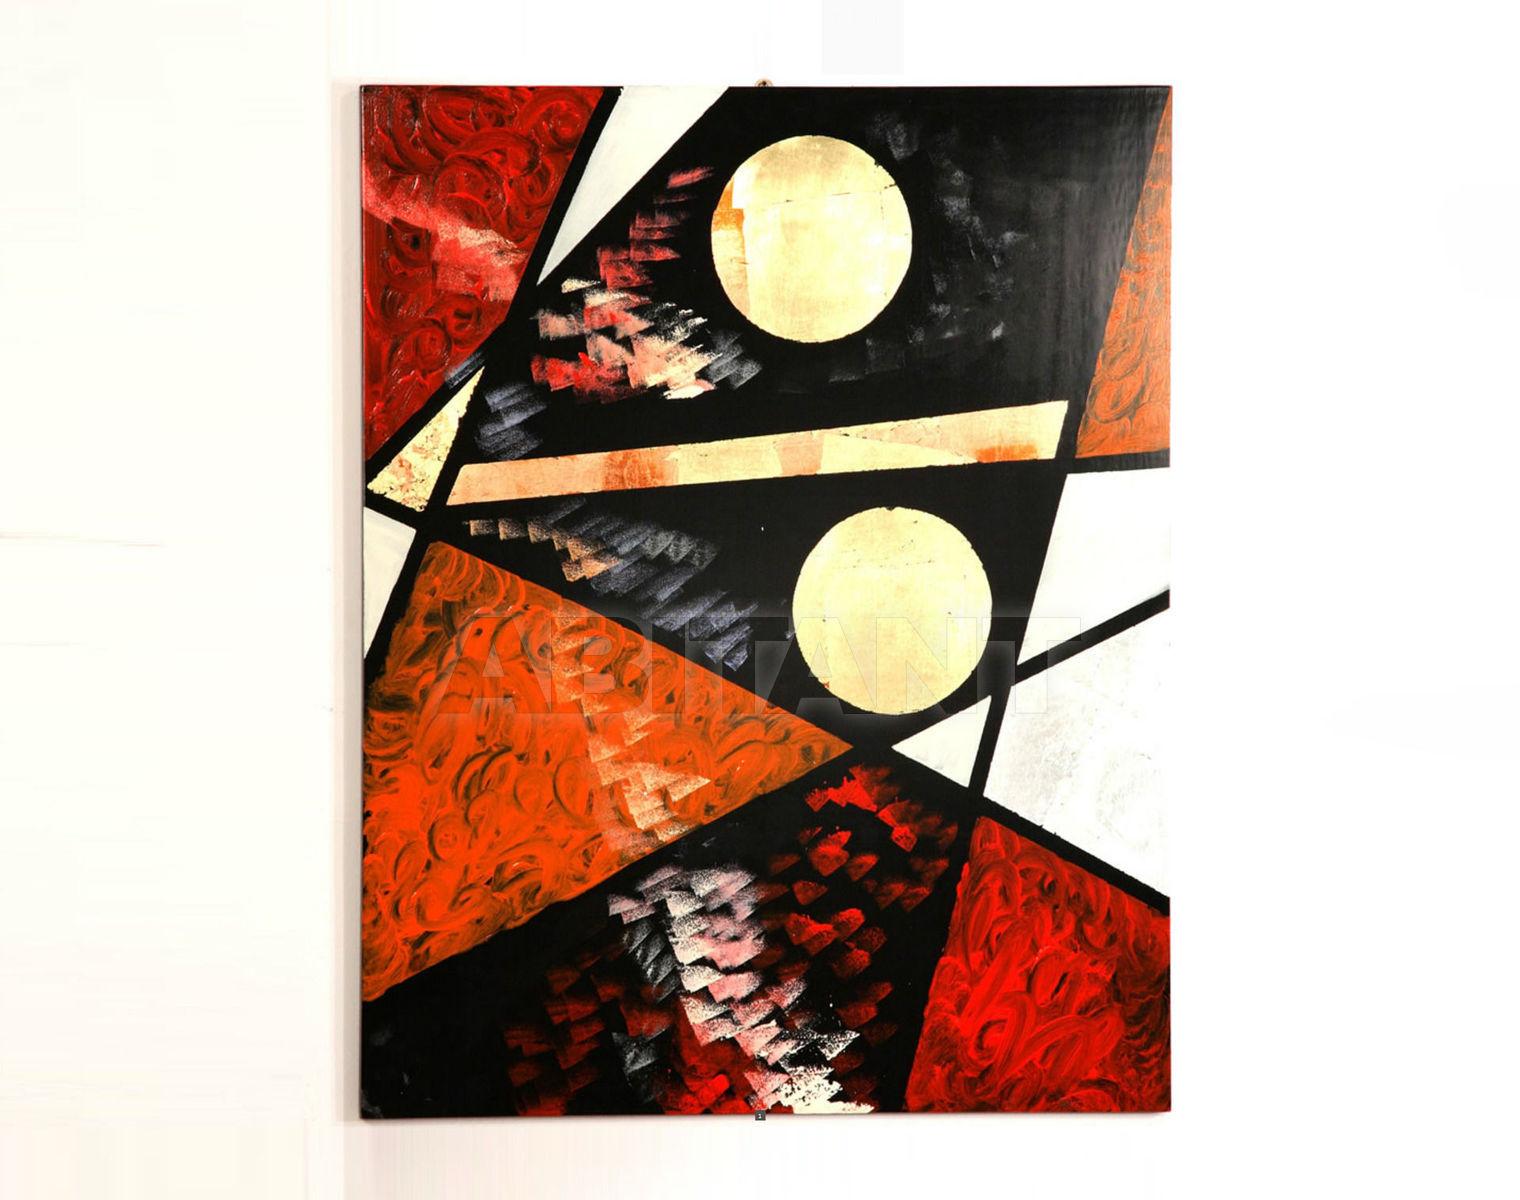 Купить Картина Planet RM Arredamenti - Capricio Capricio AQ009